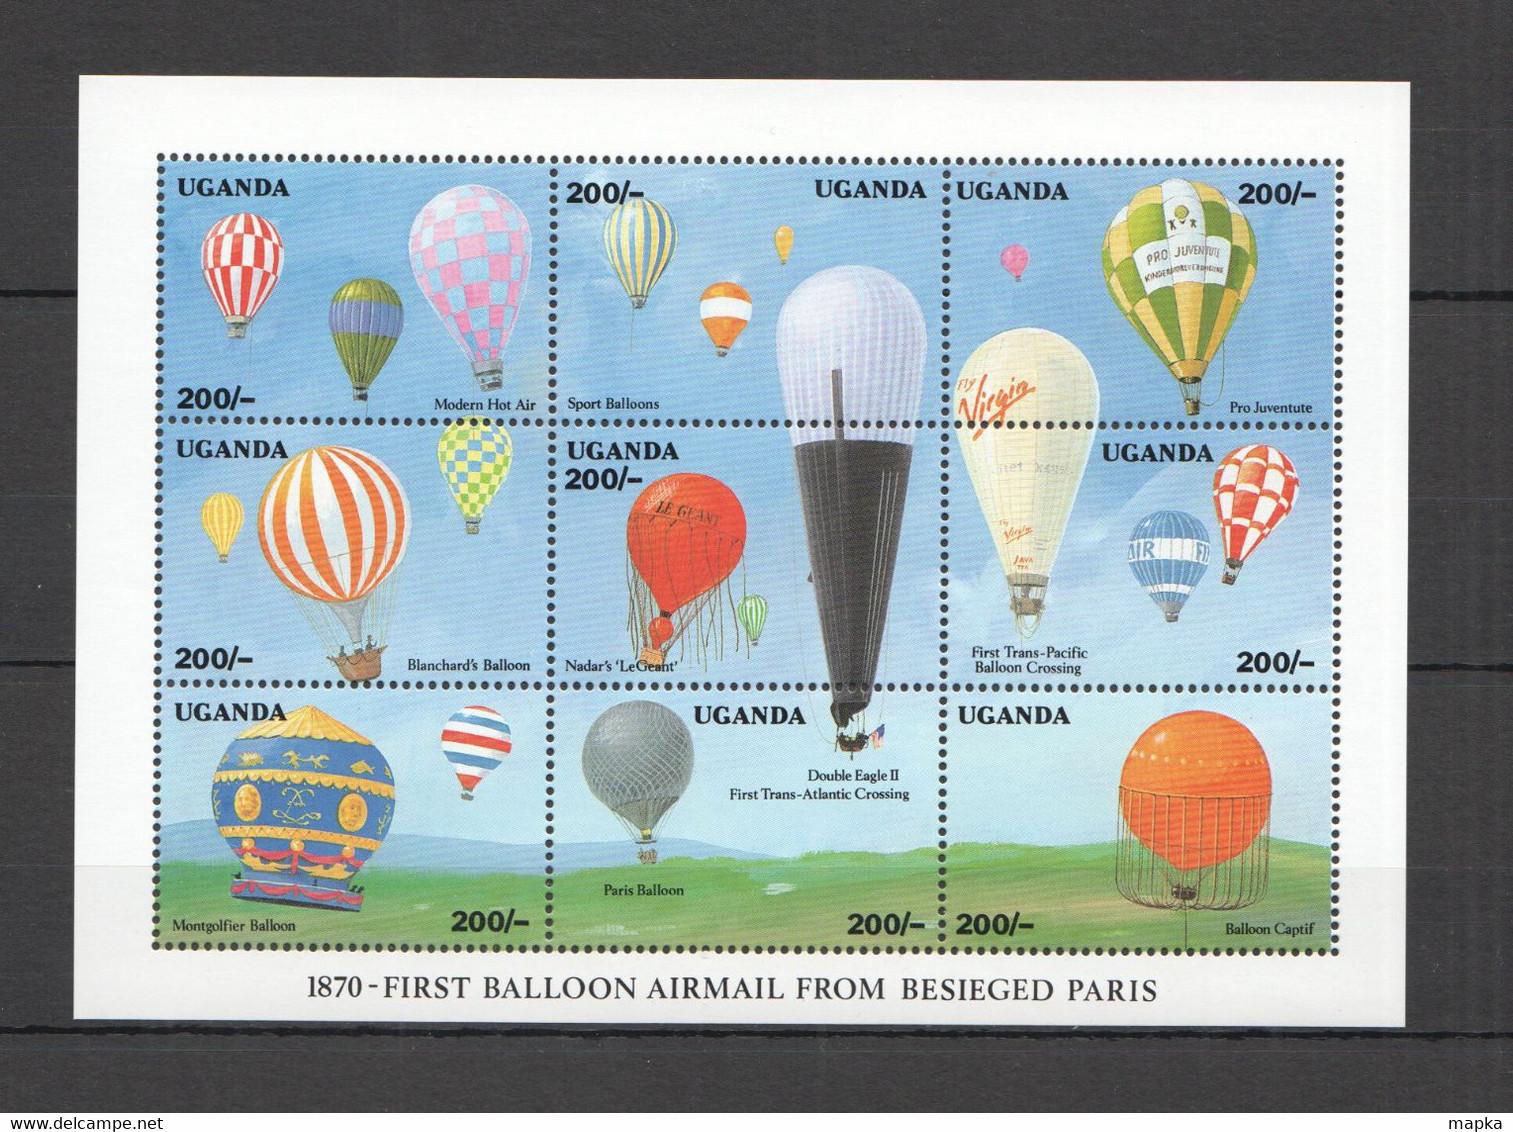 H019 UGANDA TRANSPORT AVIATION BALLOONS AIRMAIL FROM PARIS AIRSHIPS 1KB MNH - Montgolfier